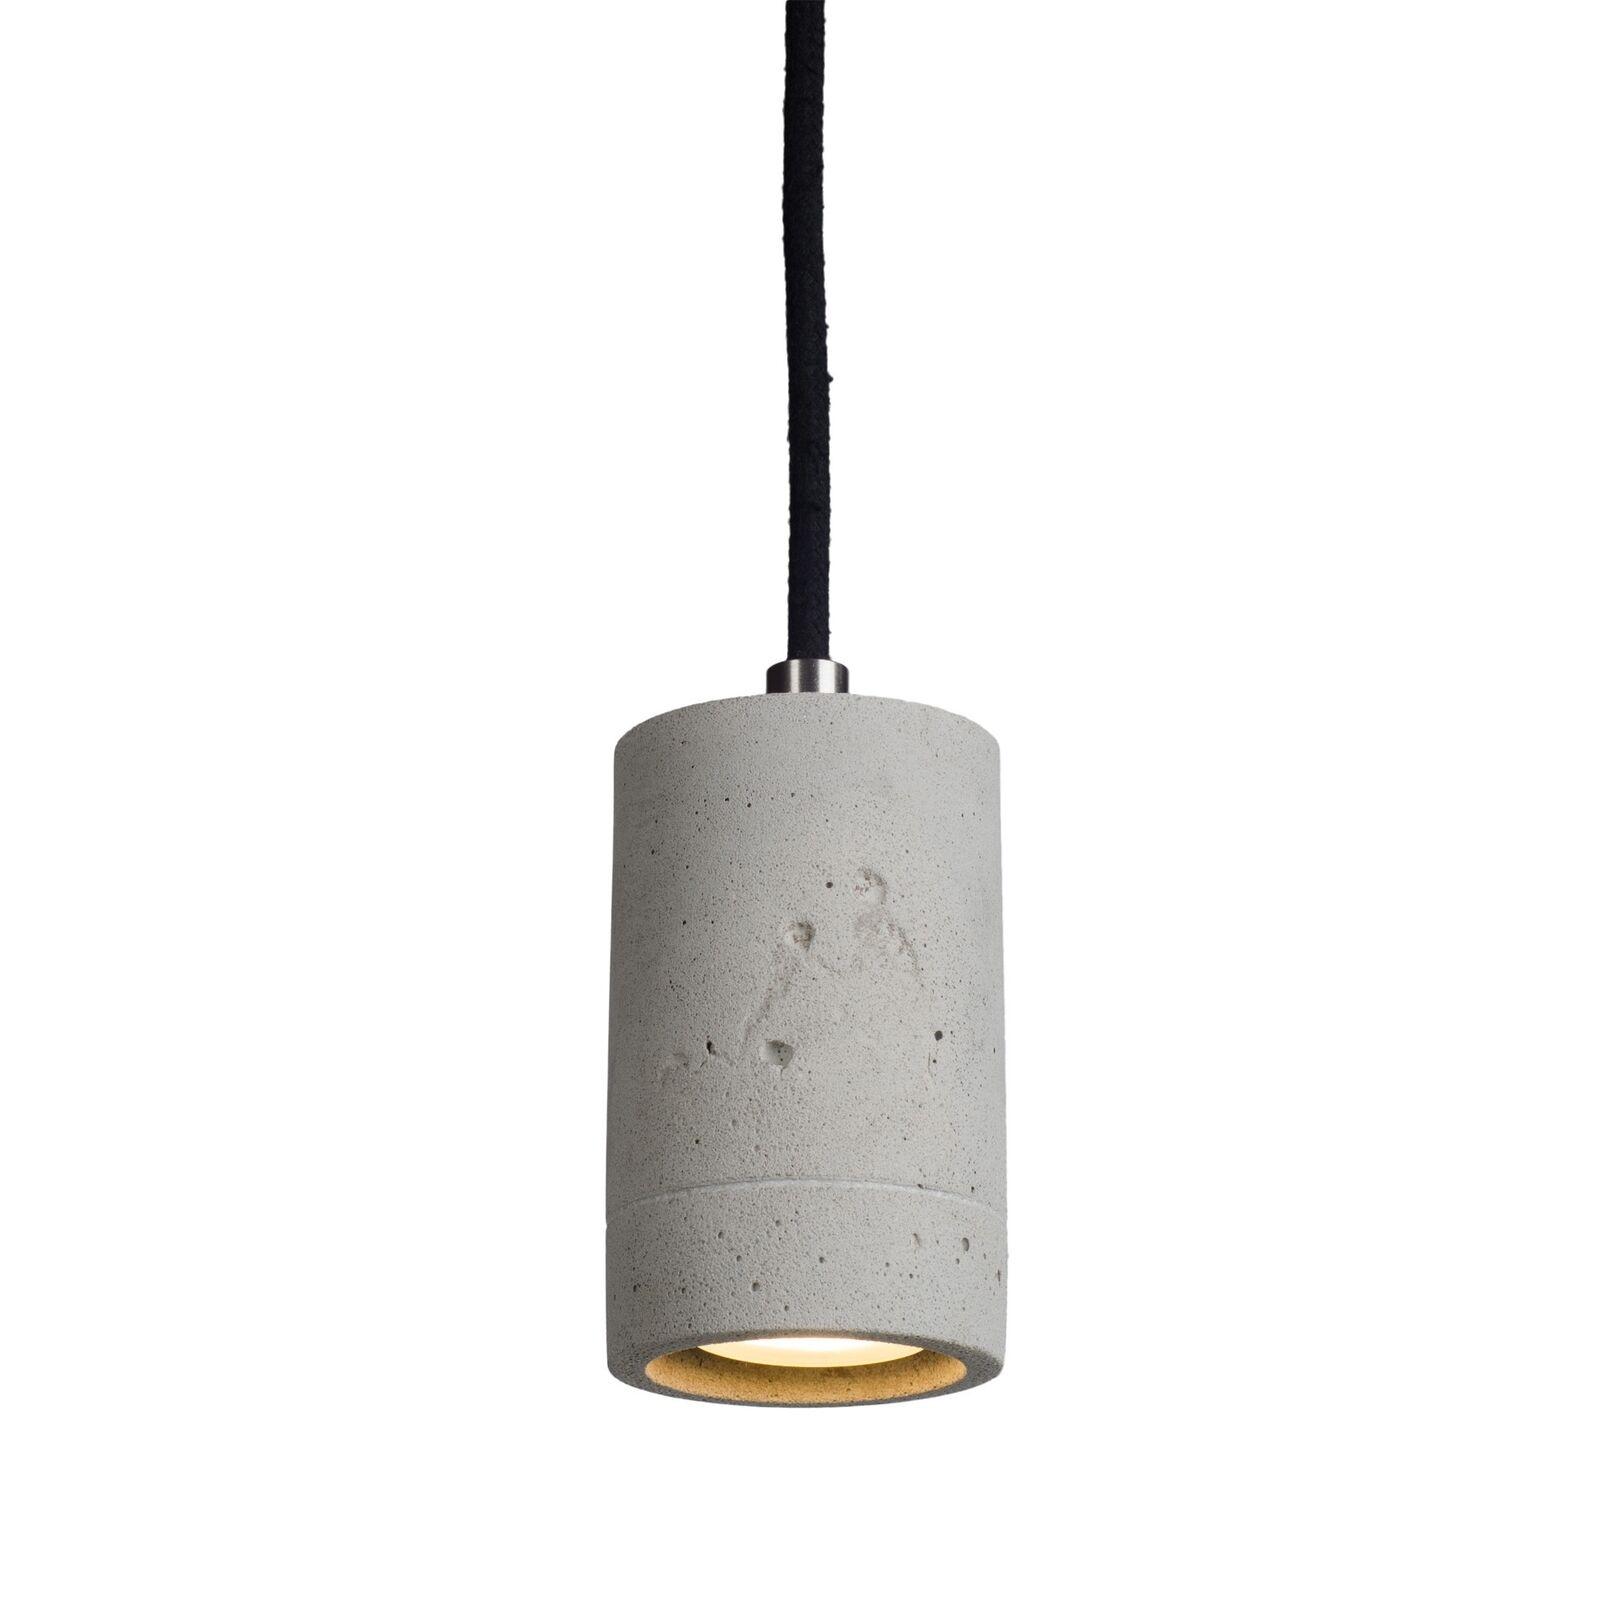 KALLA 11 Pendelleuchte Beton natur, Kabel schwarz, mit OSRAM LED 4,3W 230V GU10